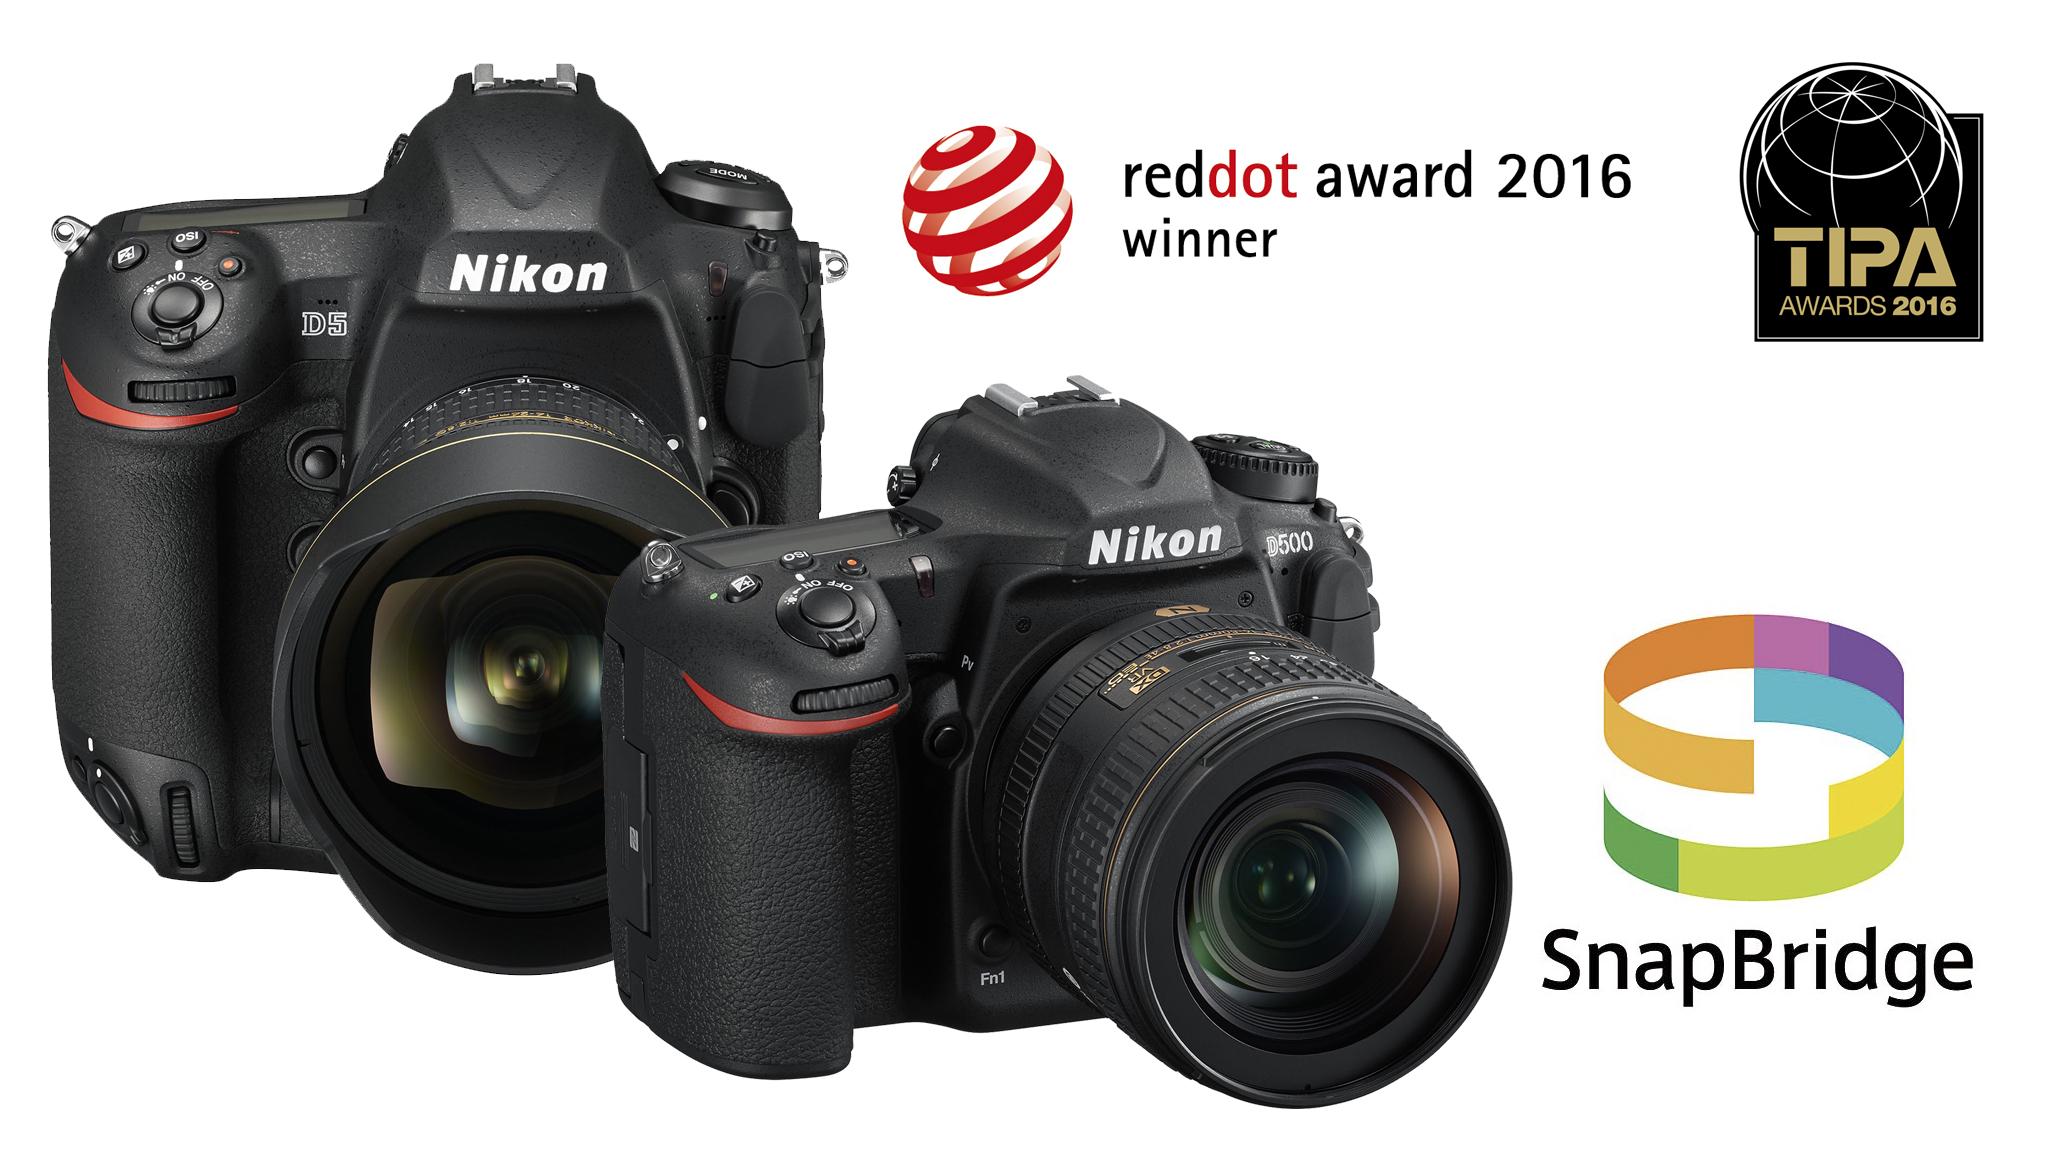 Zrkadlovky Nikon a aplikácia SnapBridge ocenené TIPA award a Red Dot Award